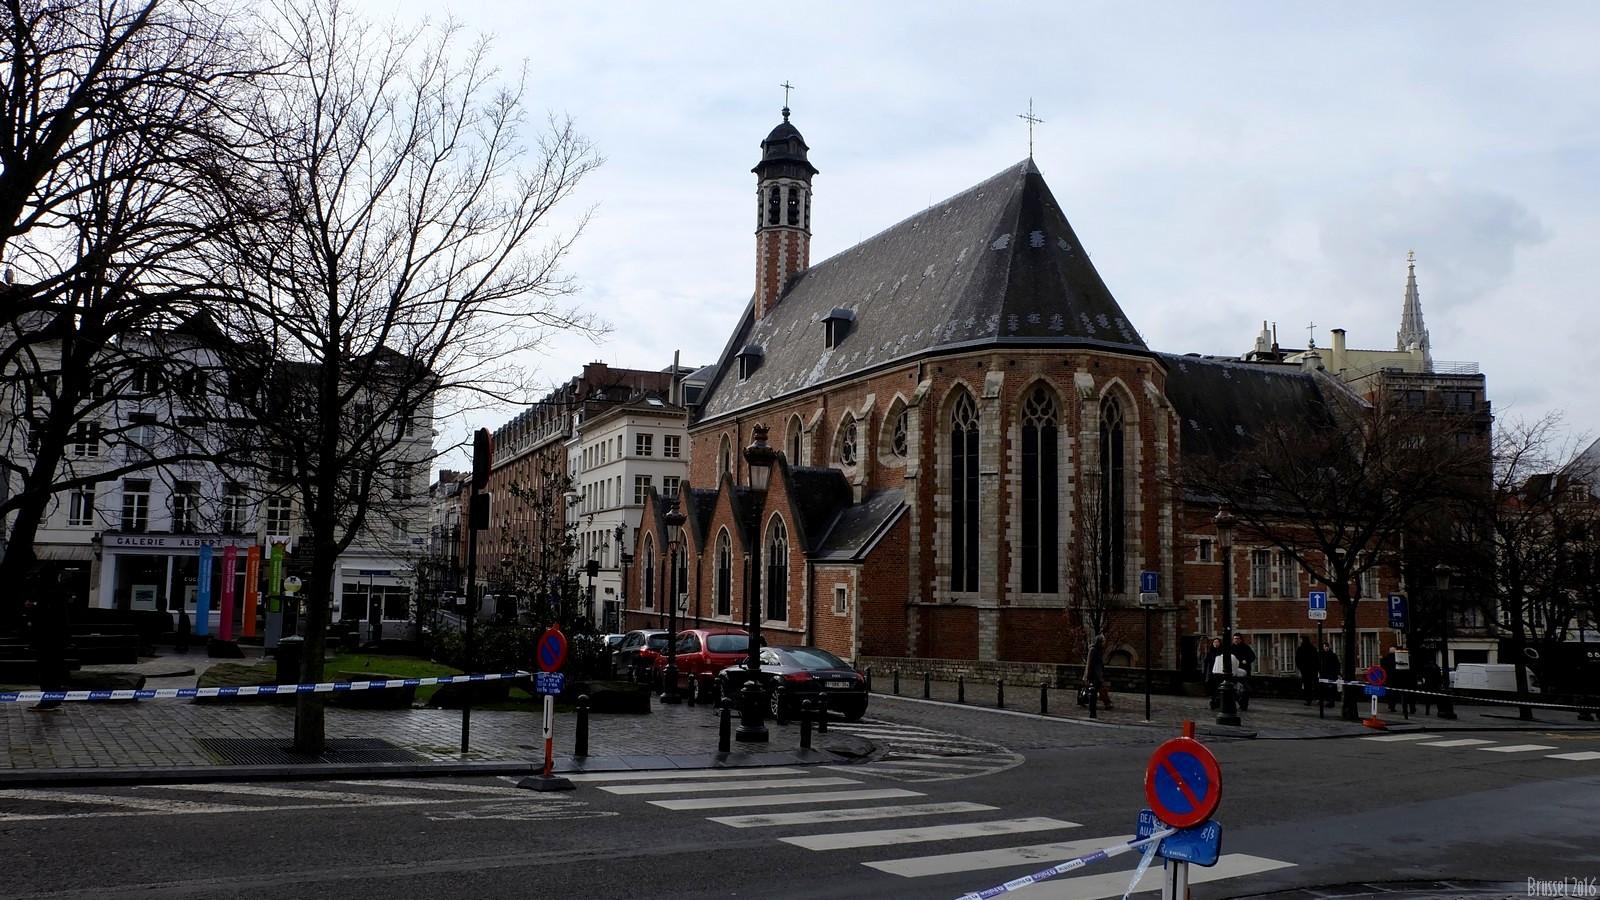 Eglise Sainte Marie-Madeleine, Brussel, Belgium